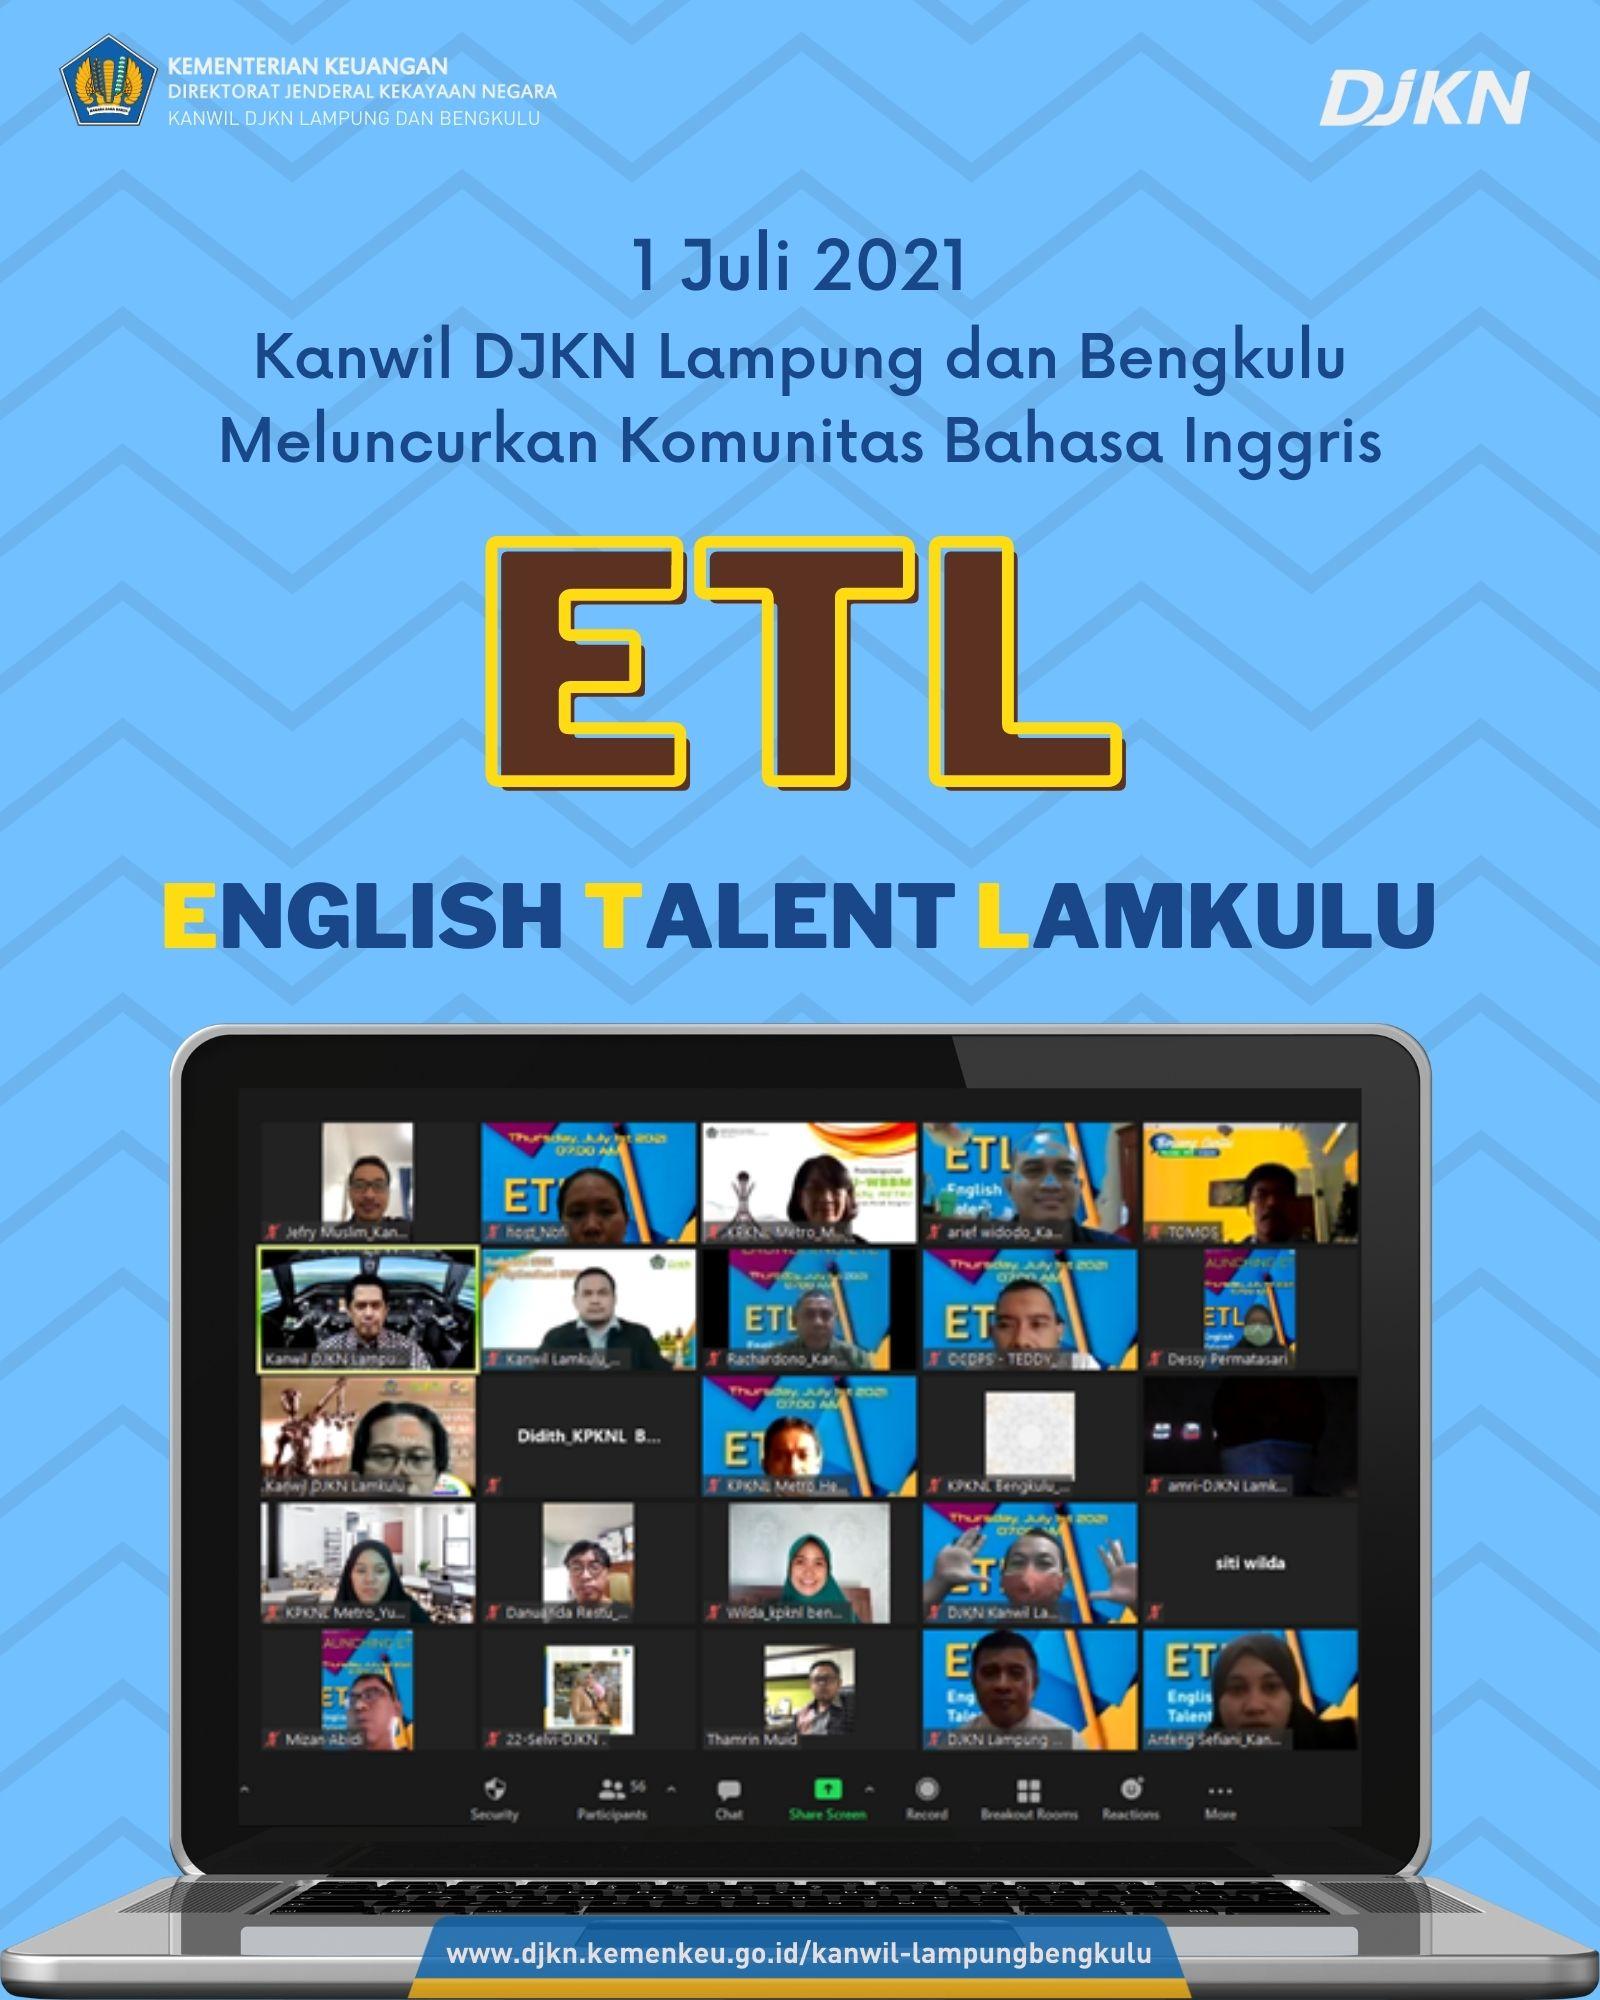 English Talent Lamkulu (ETL)